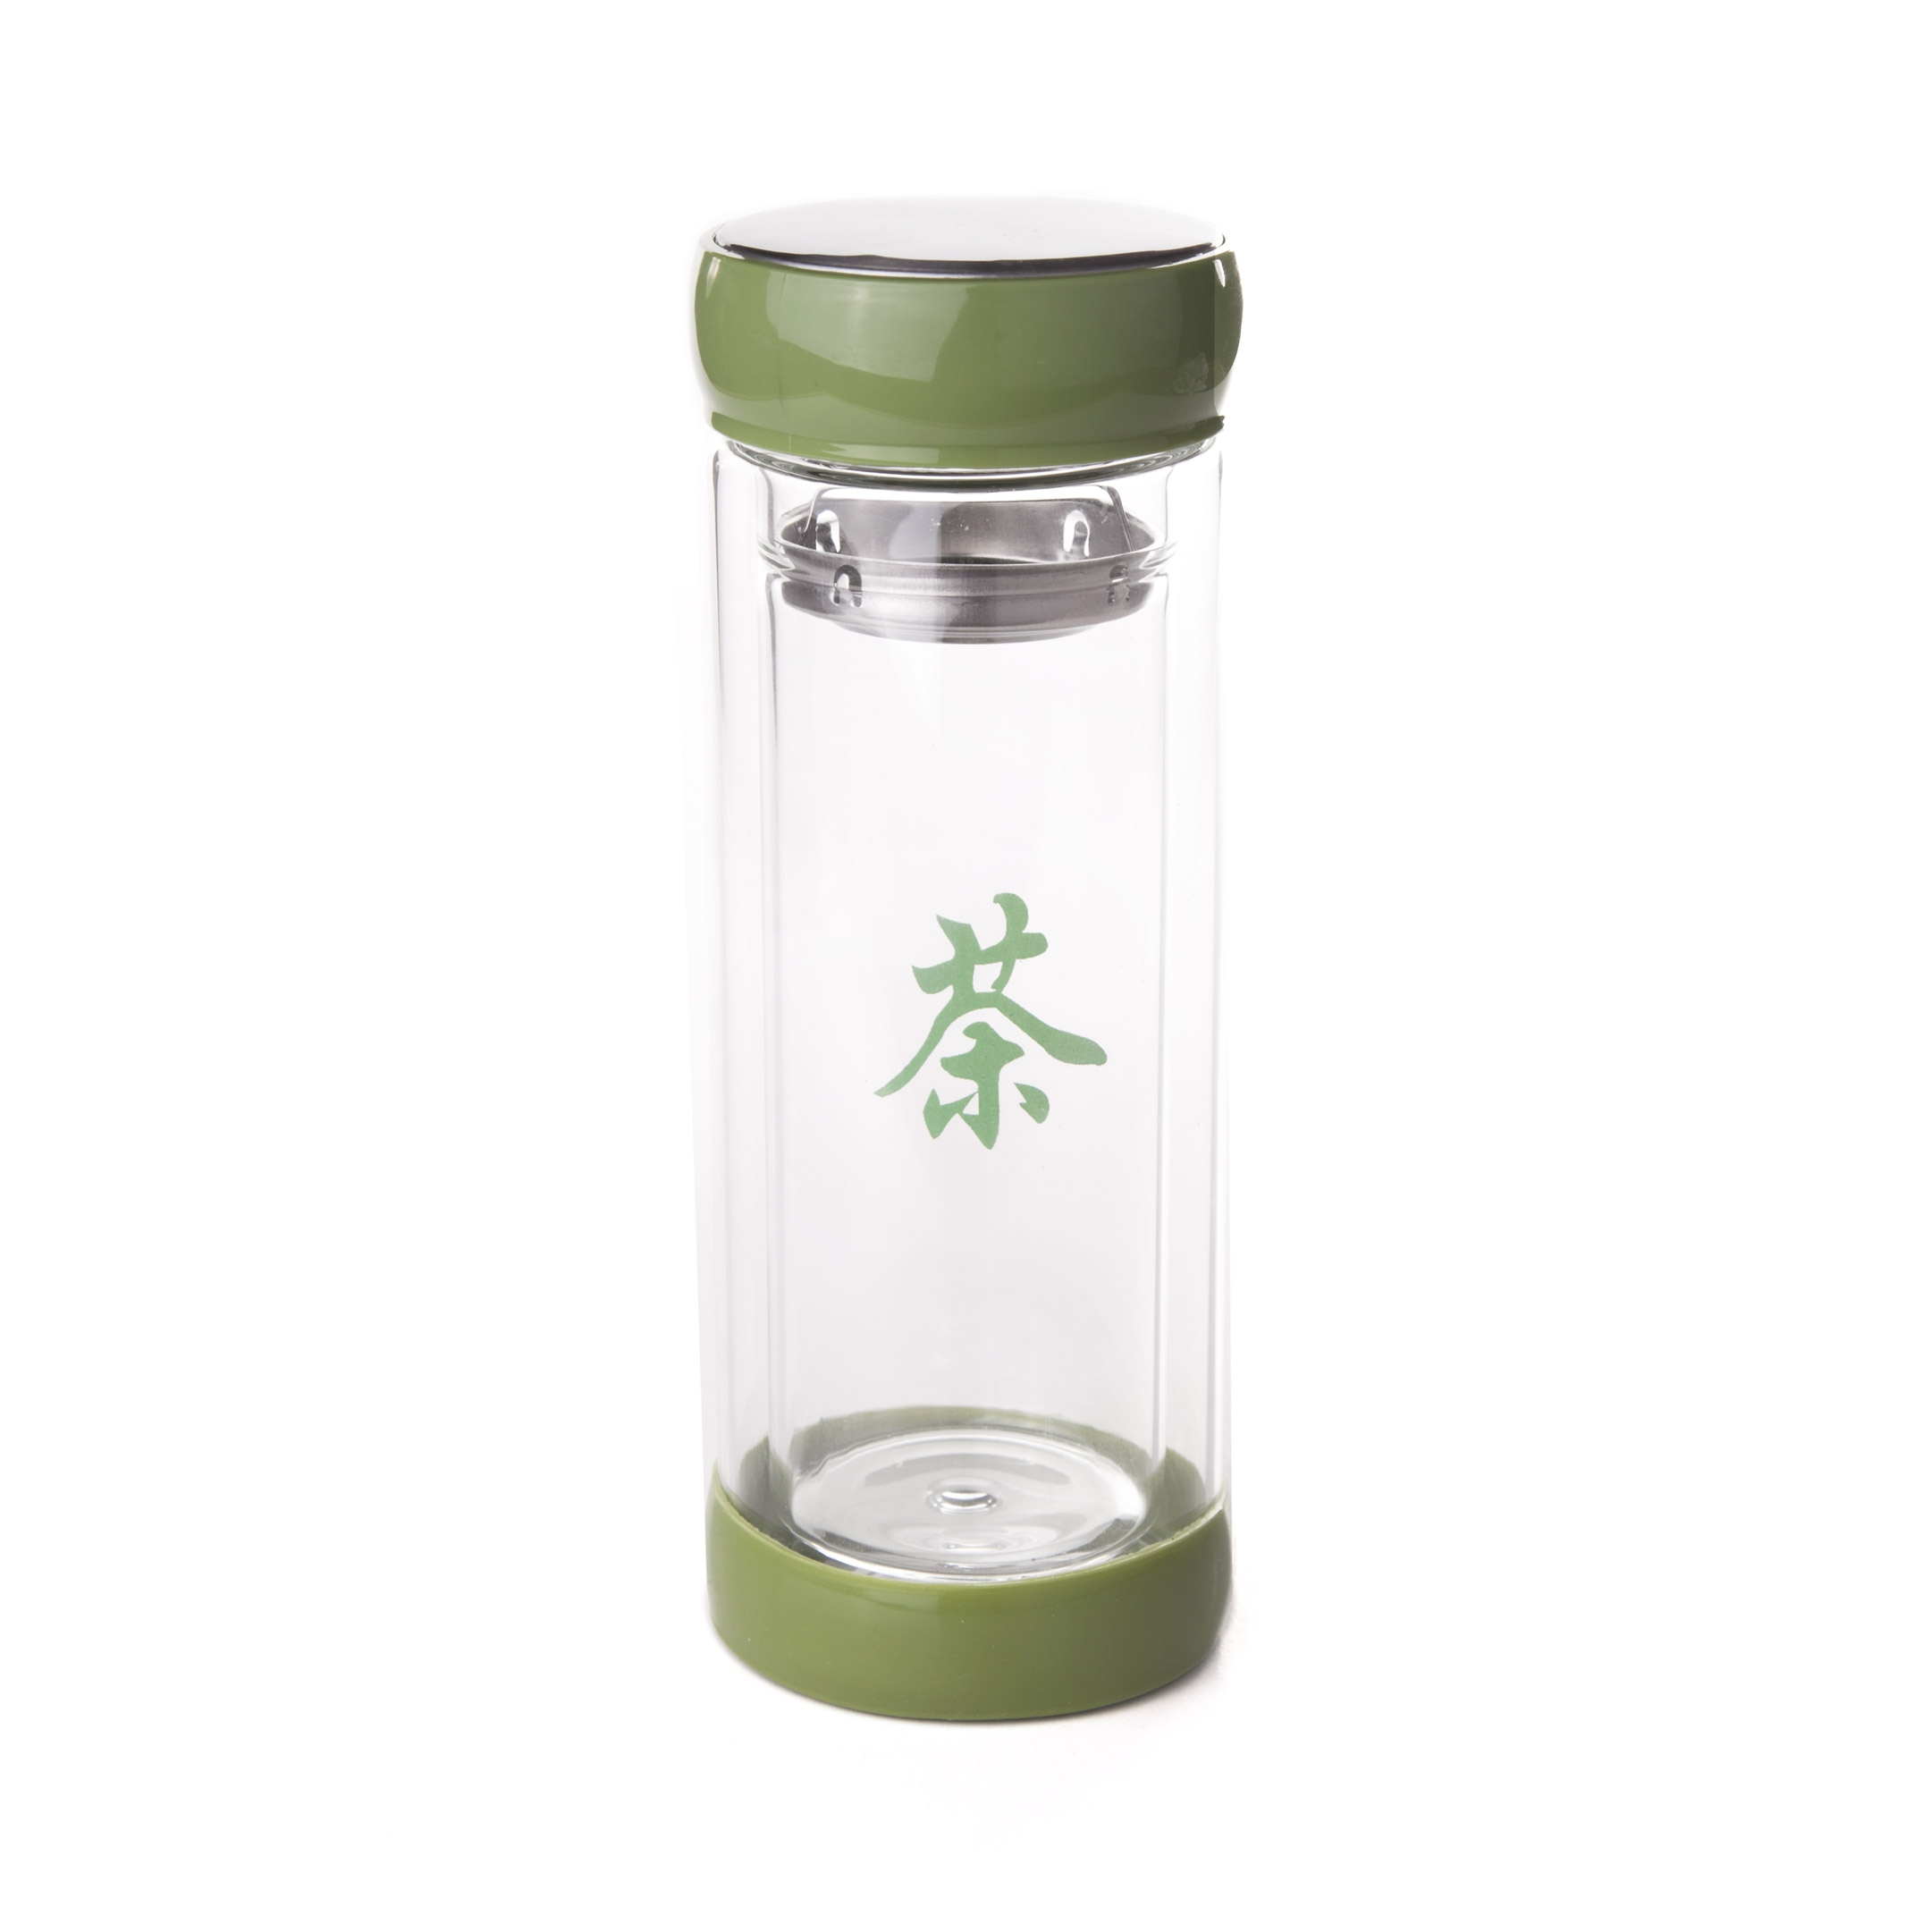 Zavarovačka na čaj sklenená - znak Cha - zelená